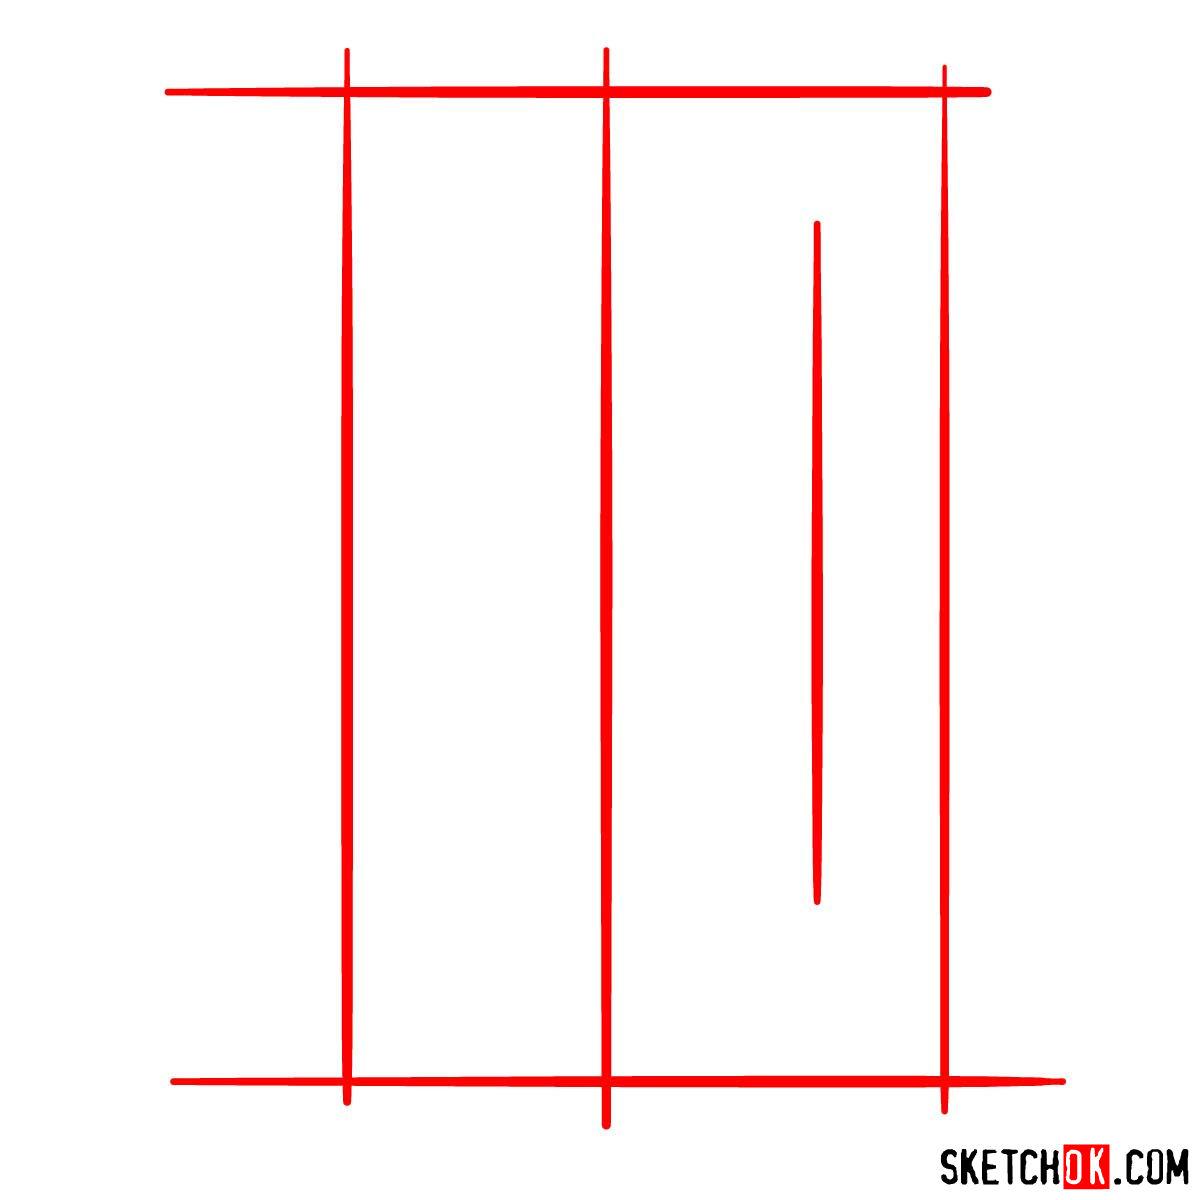 How to draw Detroit Tigers logo | MLB logos - step 01